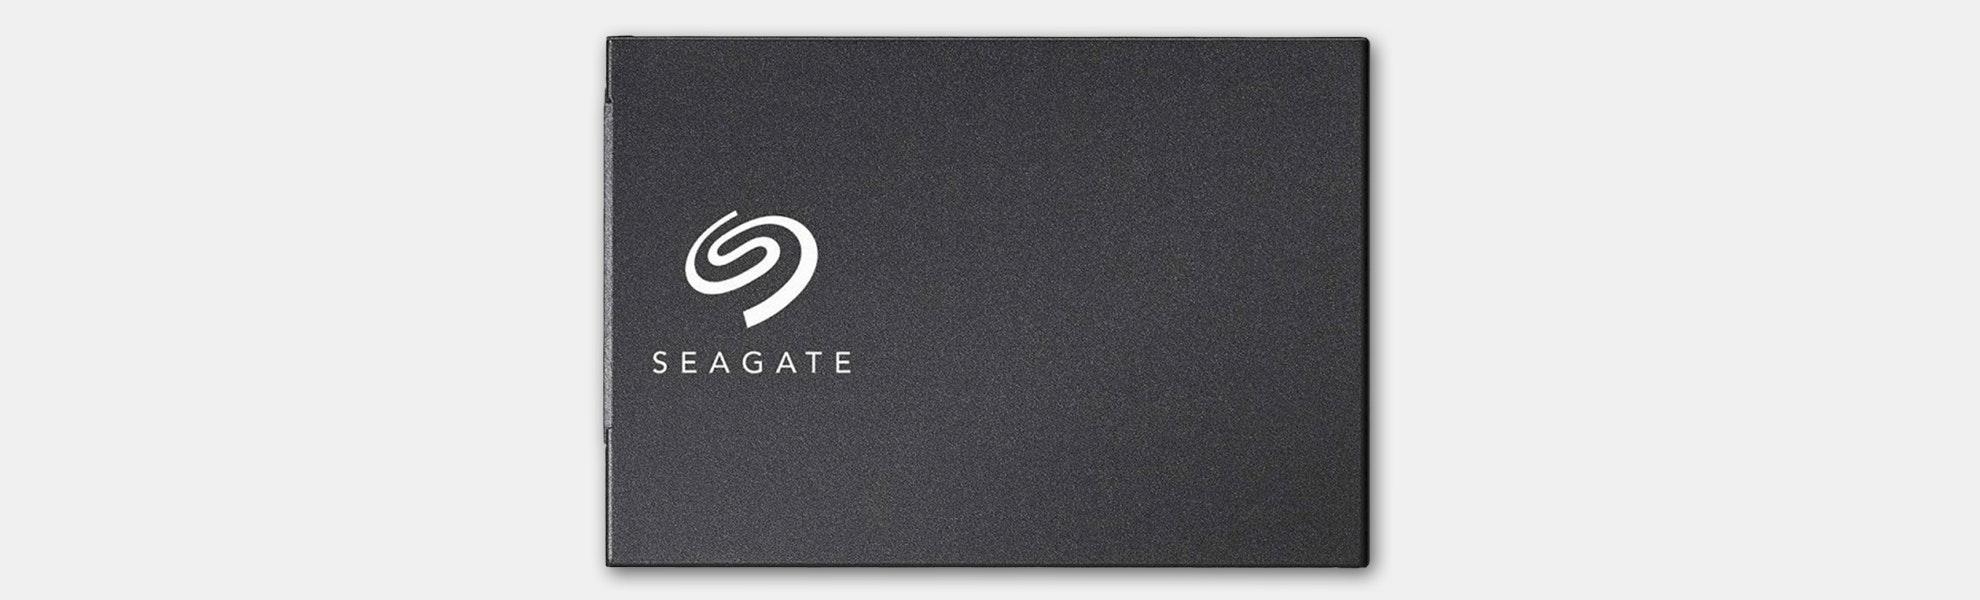 "Seagate BarraCuda 2.5"" SATA 6GB/s 3D TLC SSD Drives"